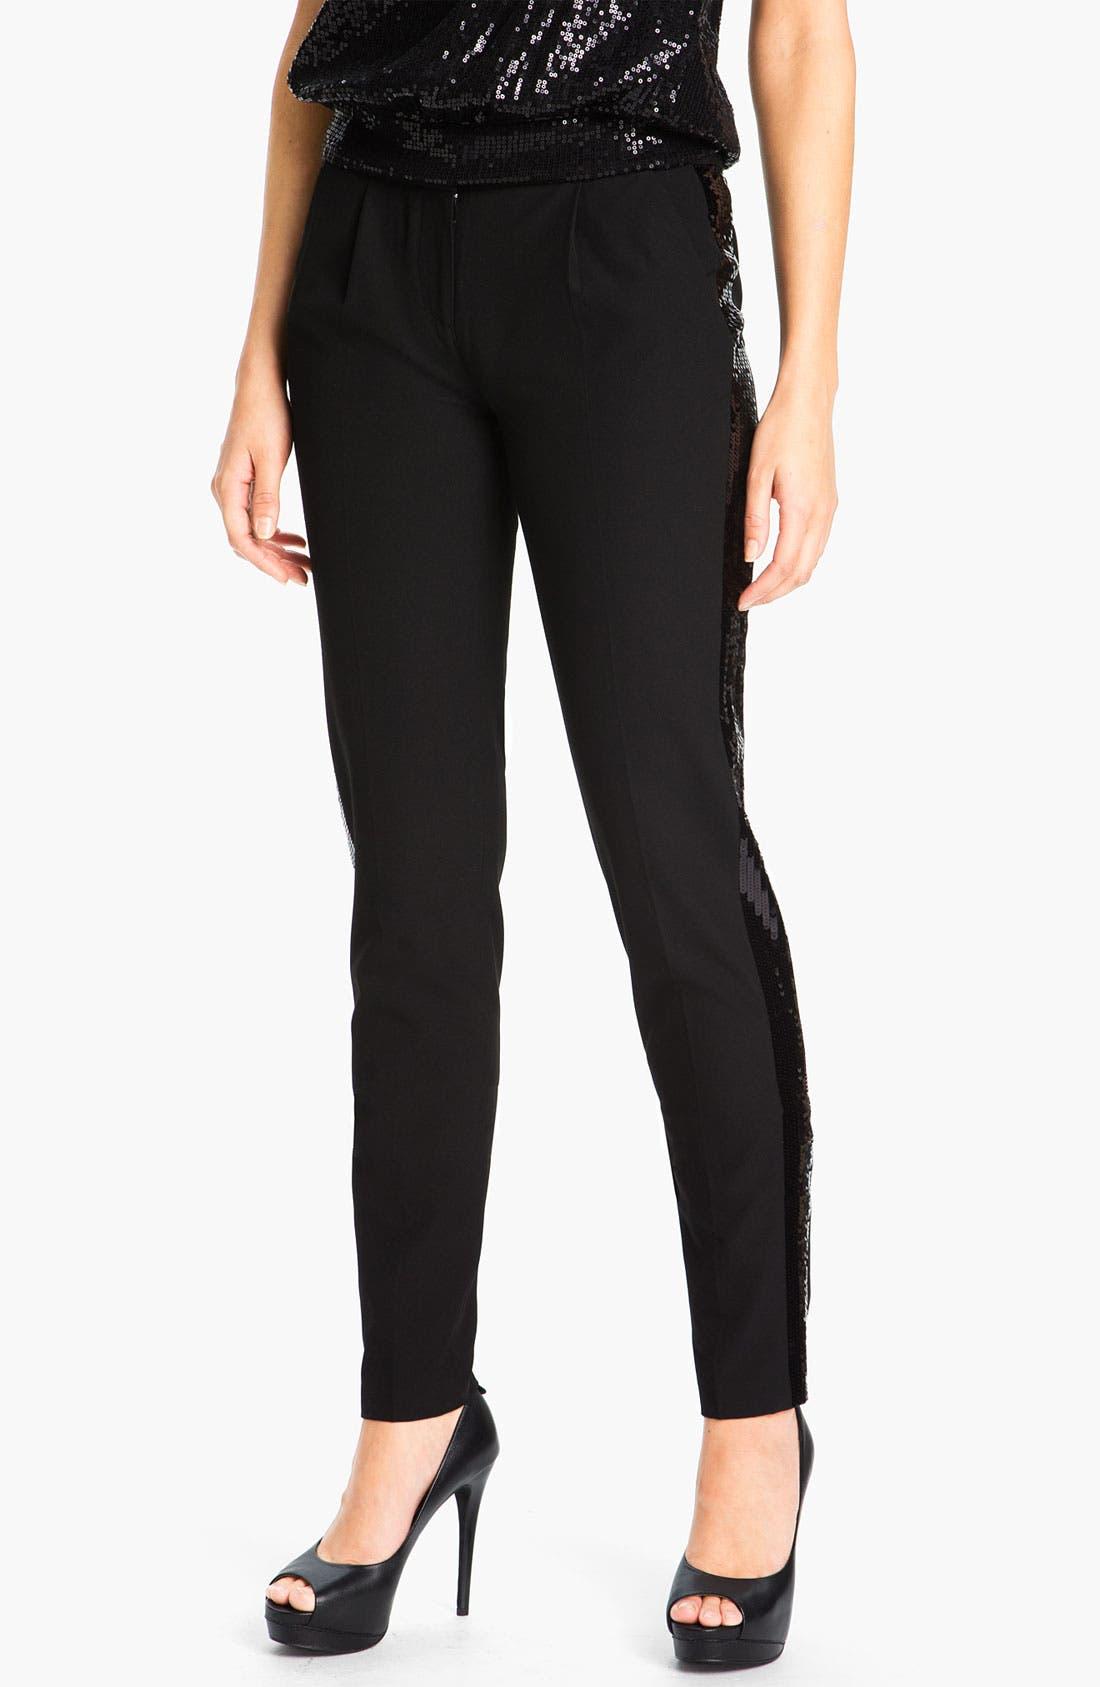 Alternate Image 1 Selected - MICHAEL Michael Kors Sequin Tuxedo Pants